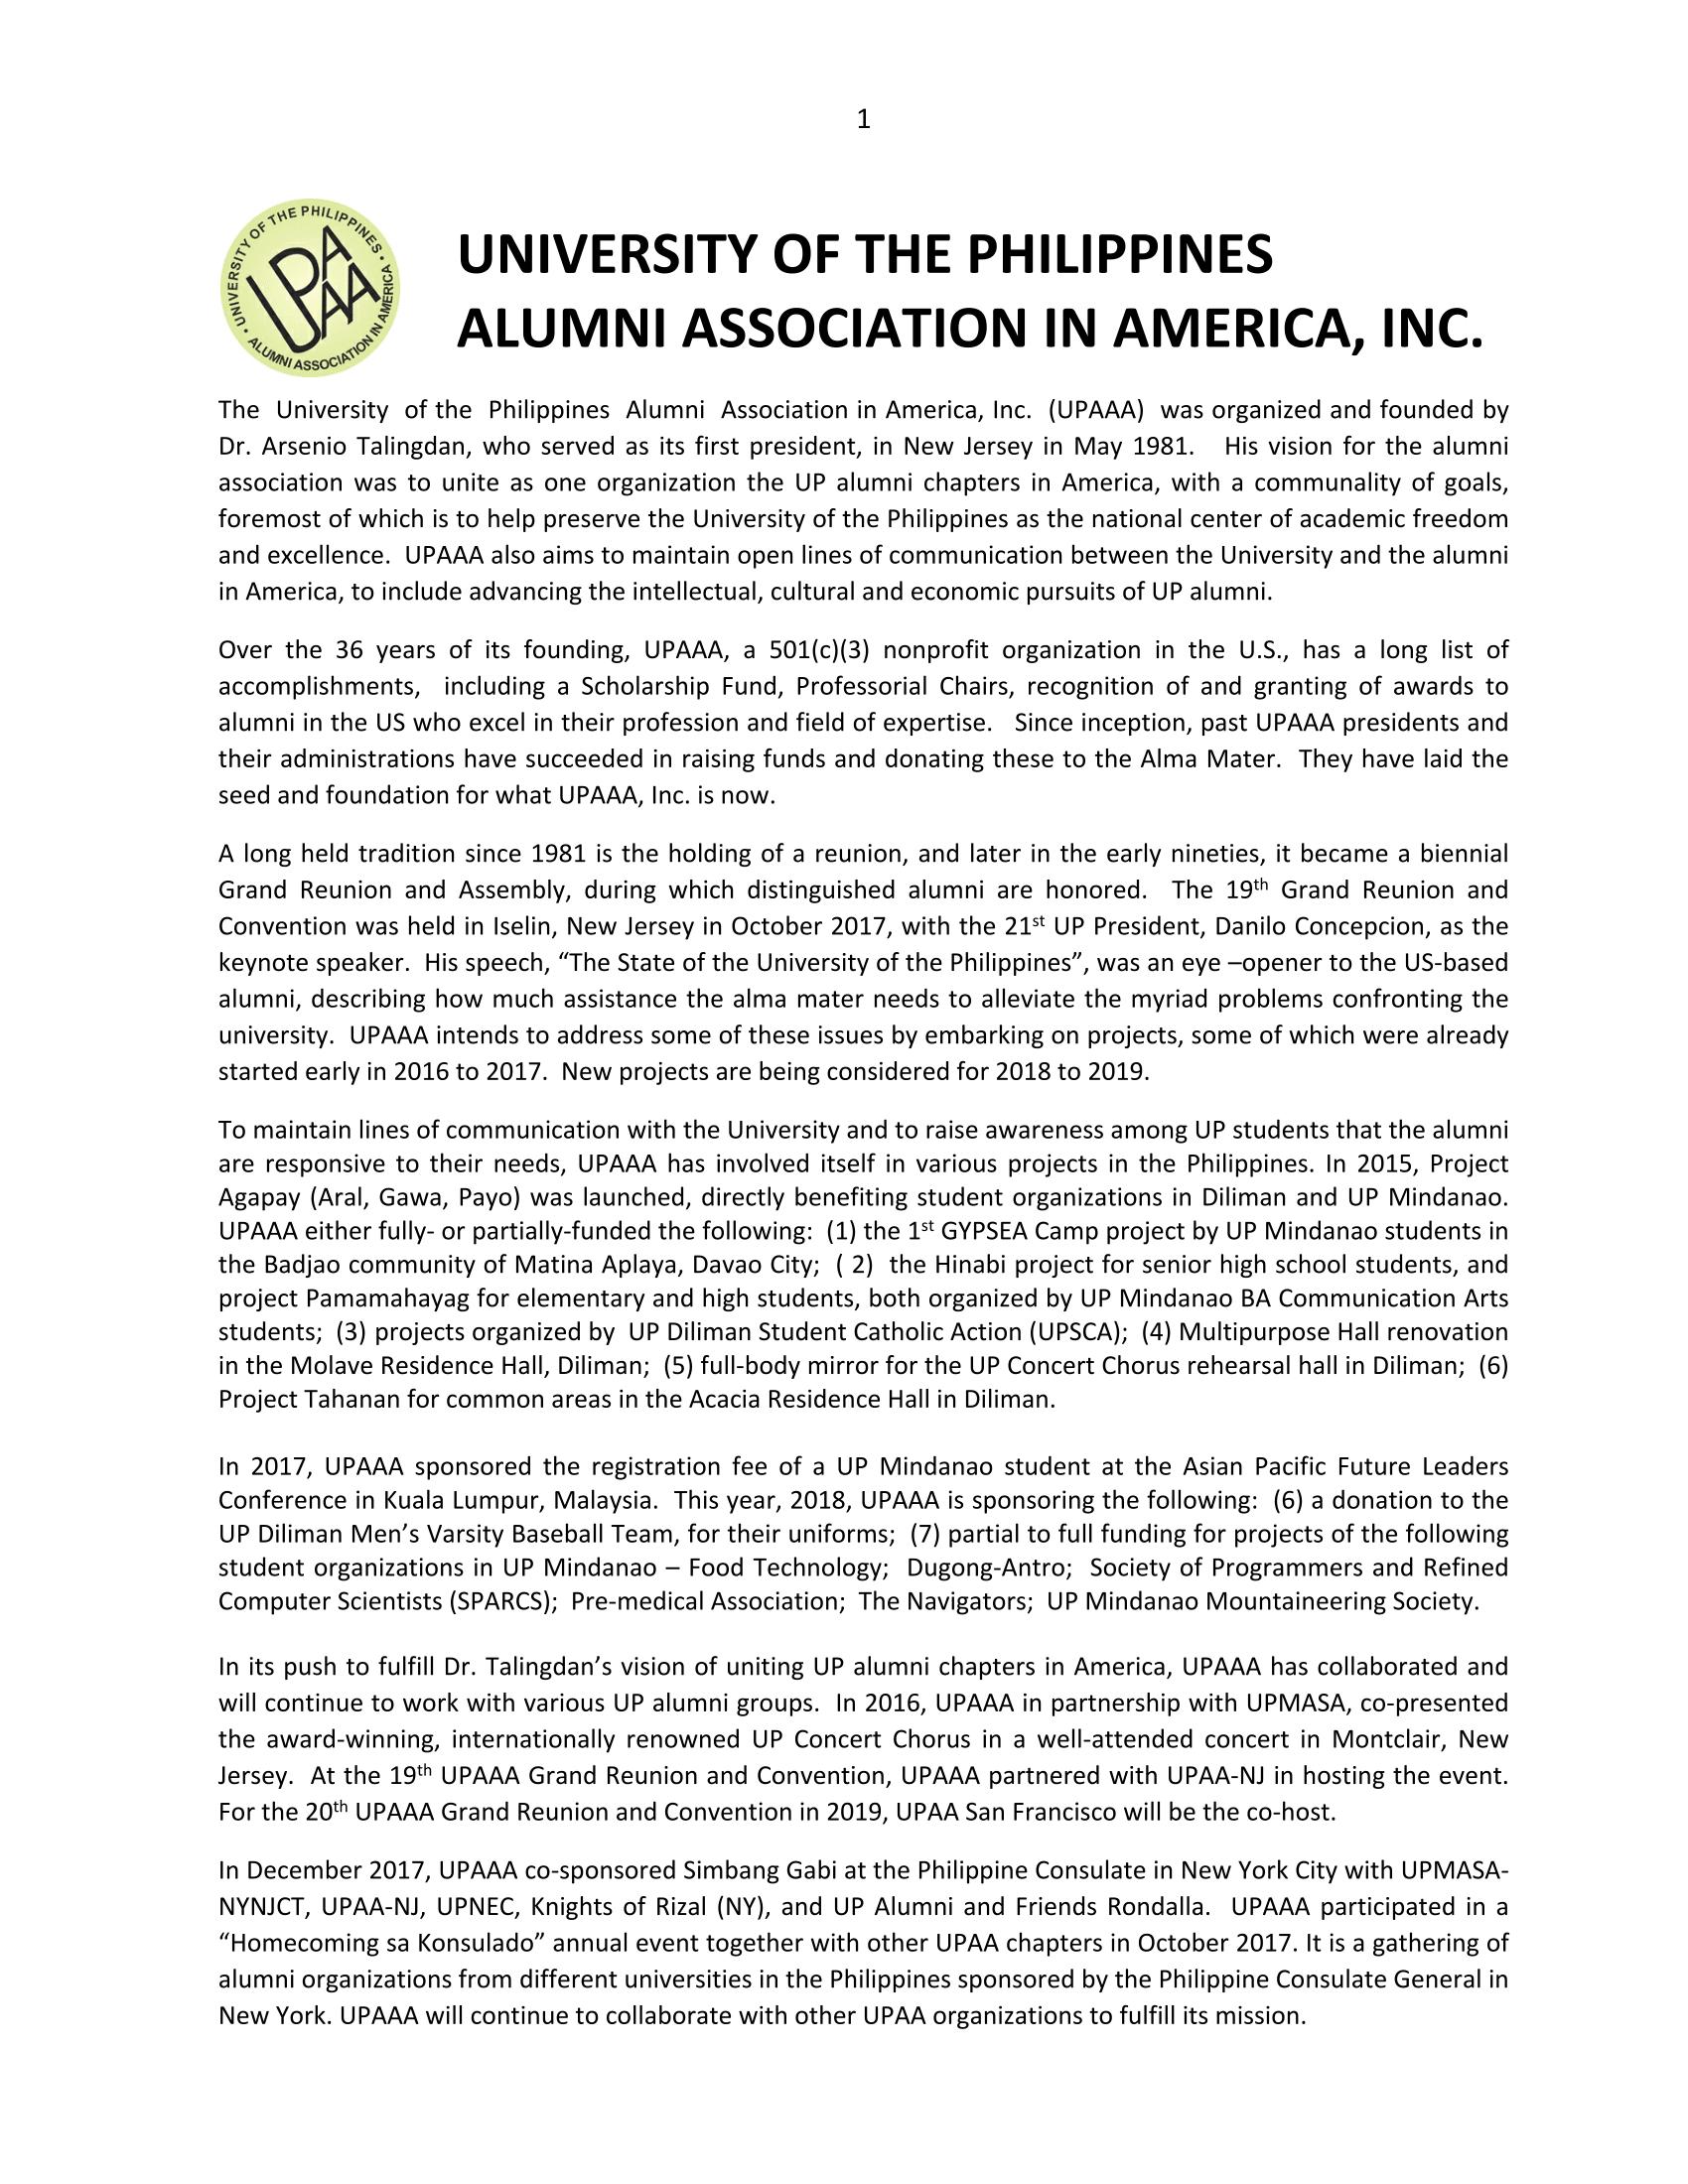 UPAAA  2  2018 UPAA Yearbook (002)-1.png